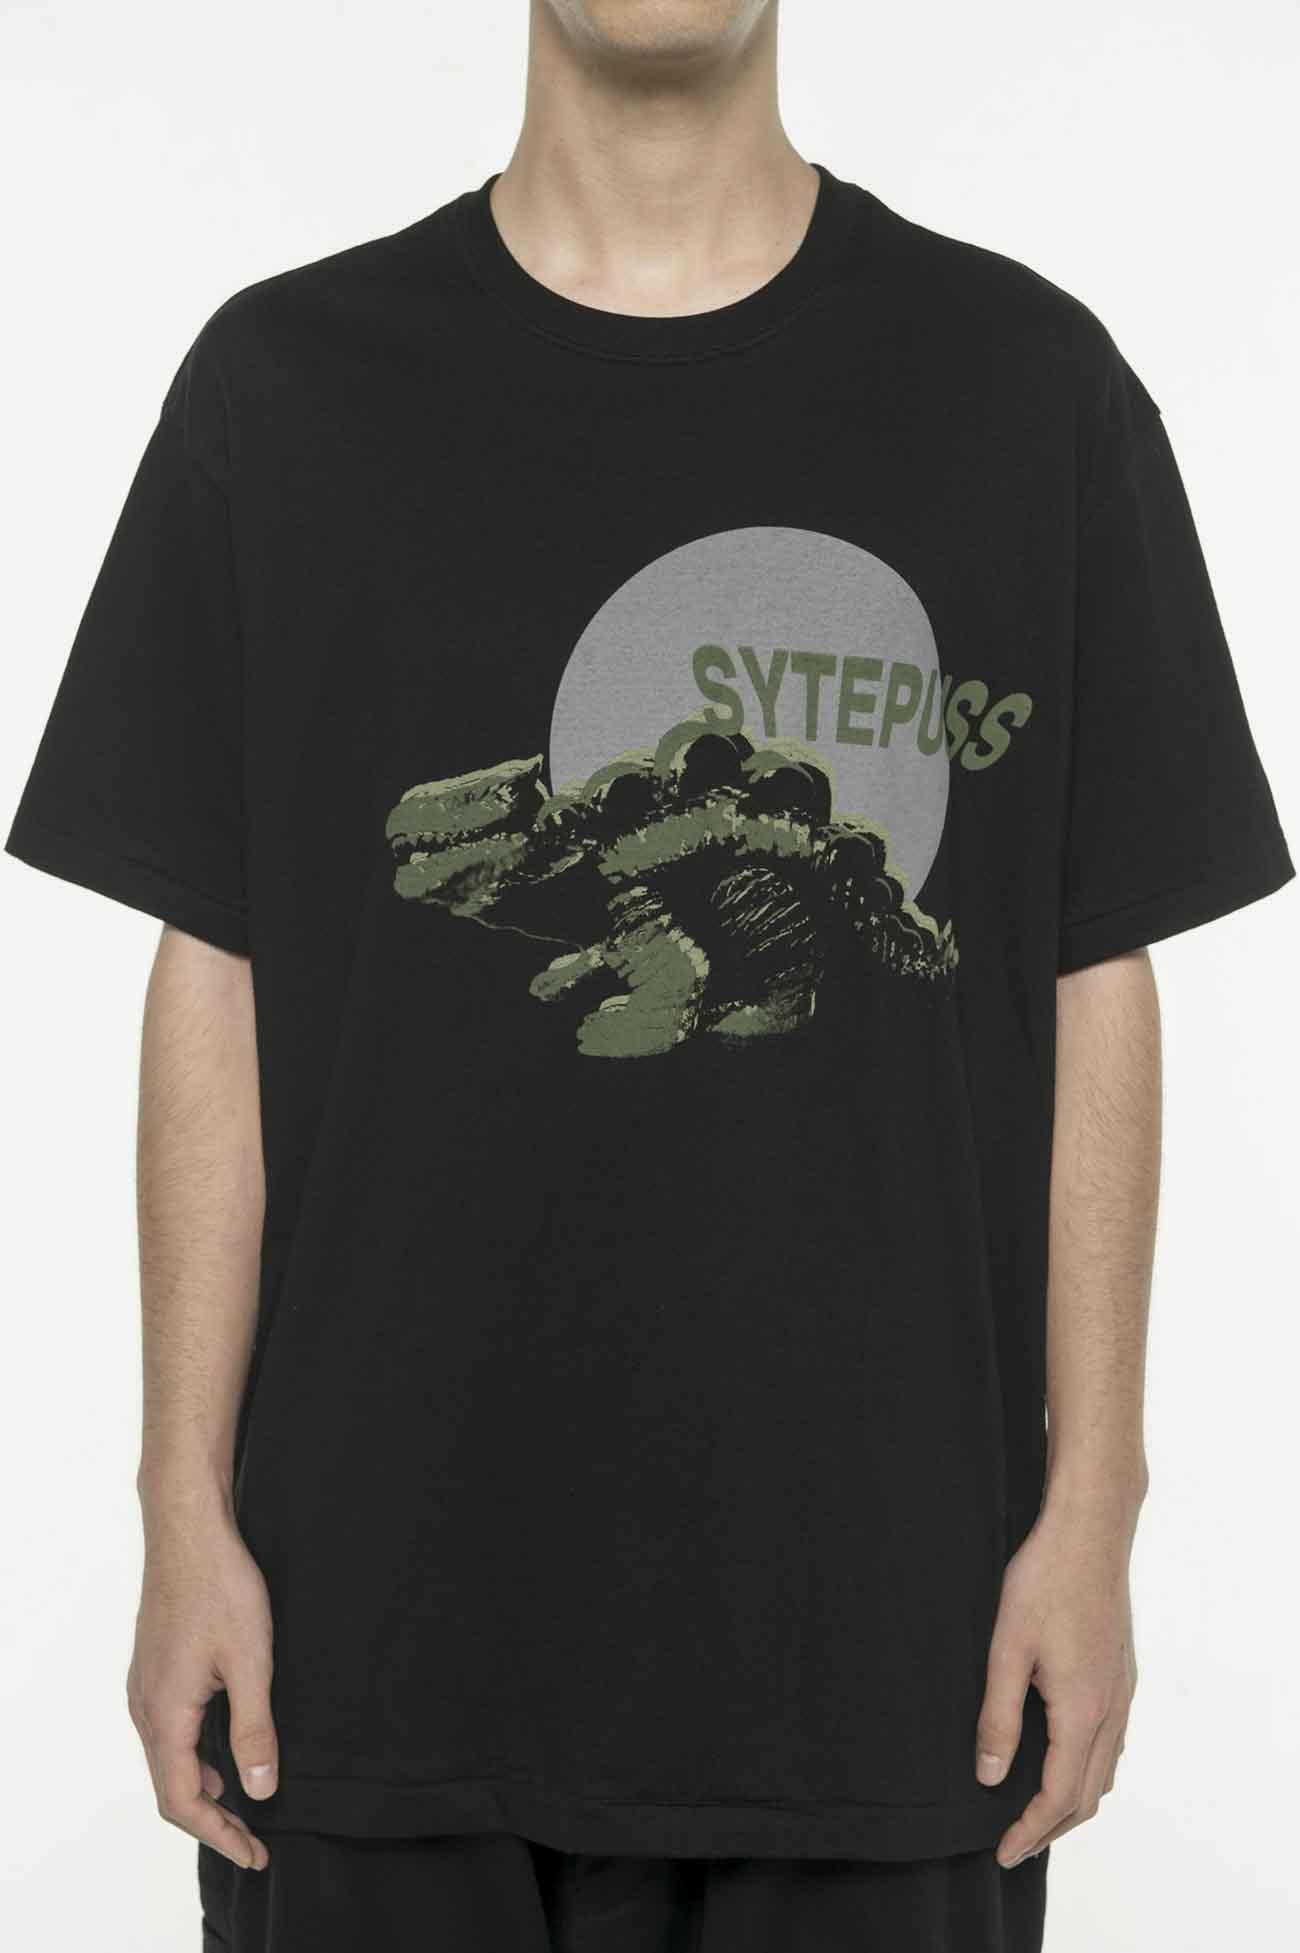 剑龙 SYTEPUSS T恤